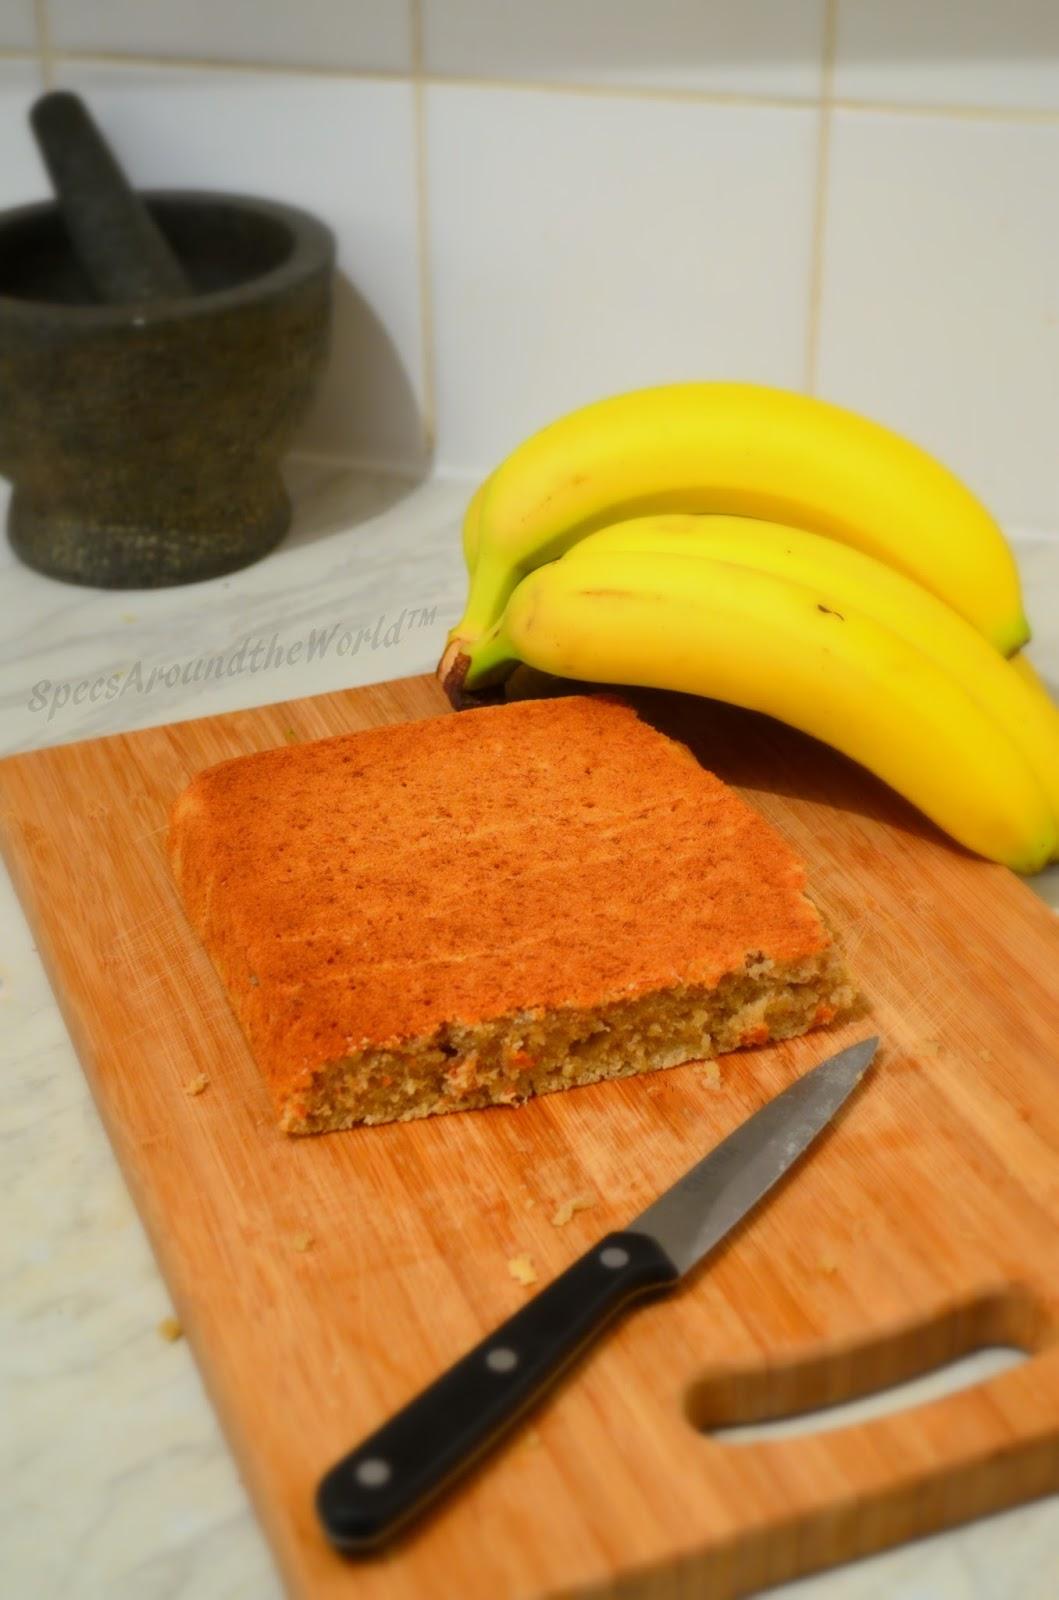 212 Recipe Yummy Delicious Banana Bread: Easy, Cheap And Delicious Banana Bread